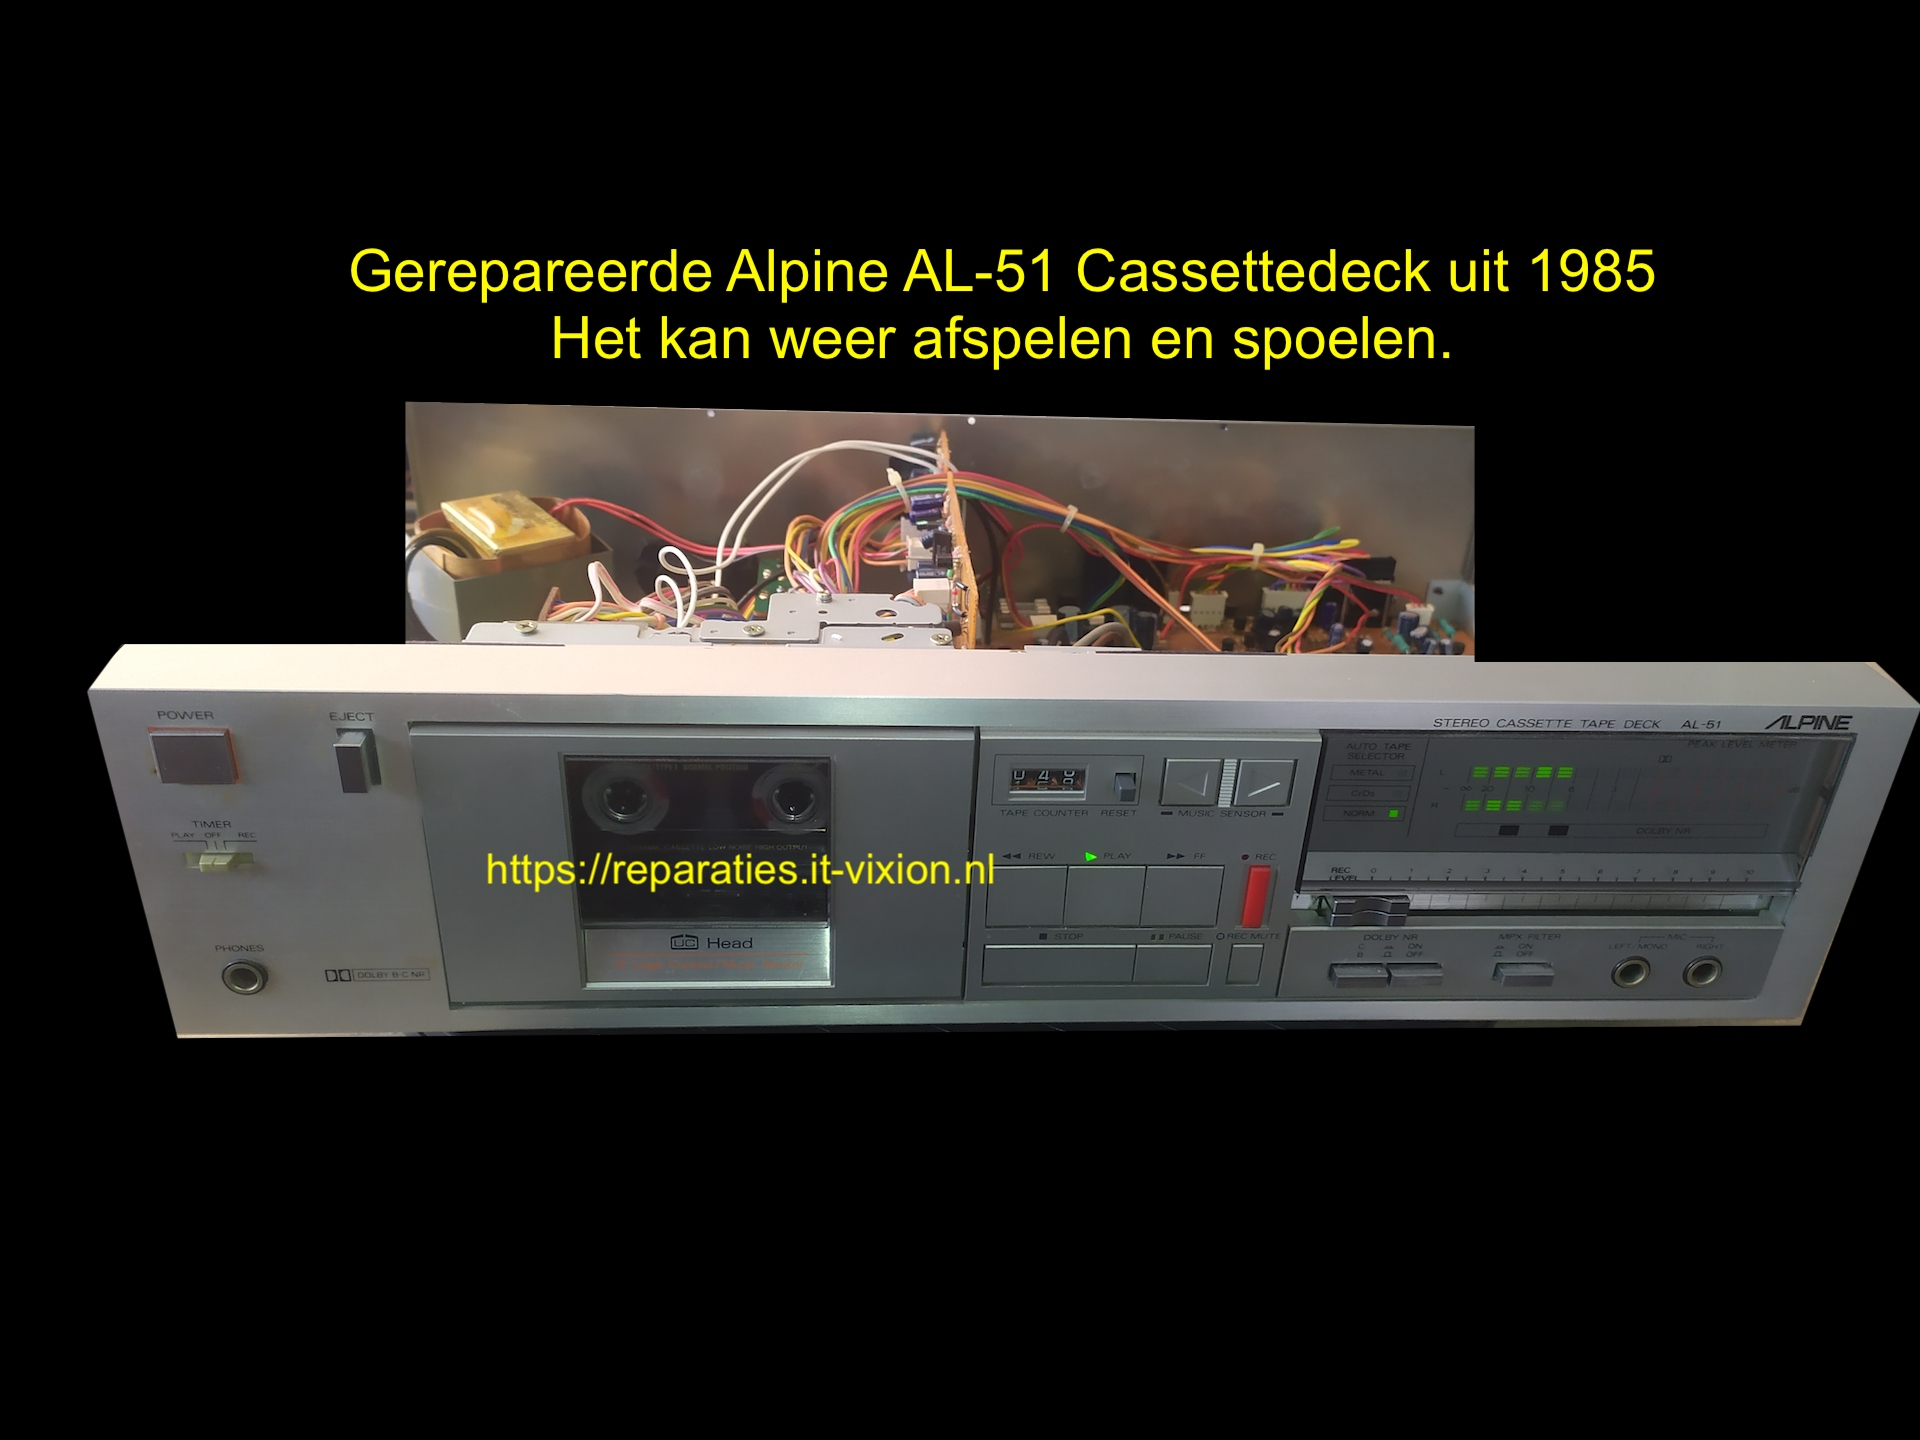 Alpine AL-51 Cassettedeck uit 1985